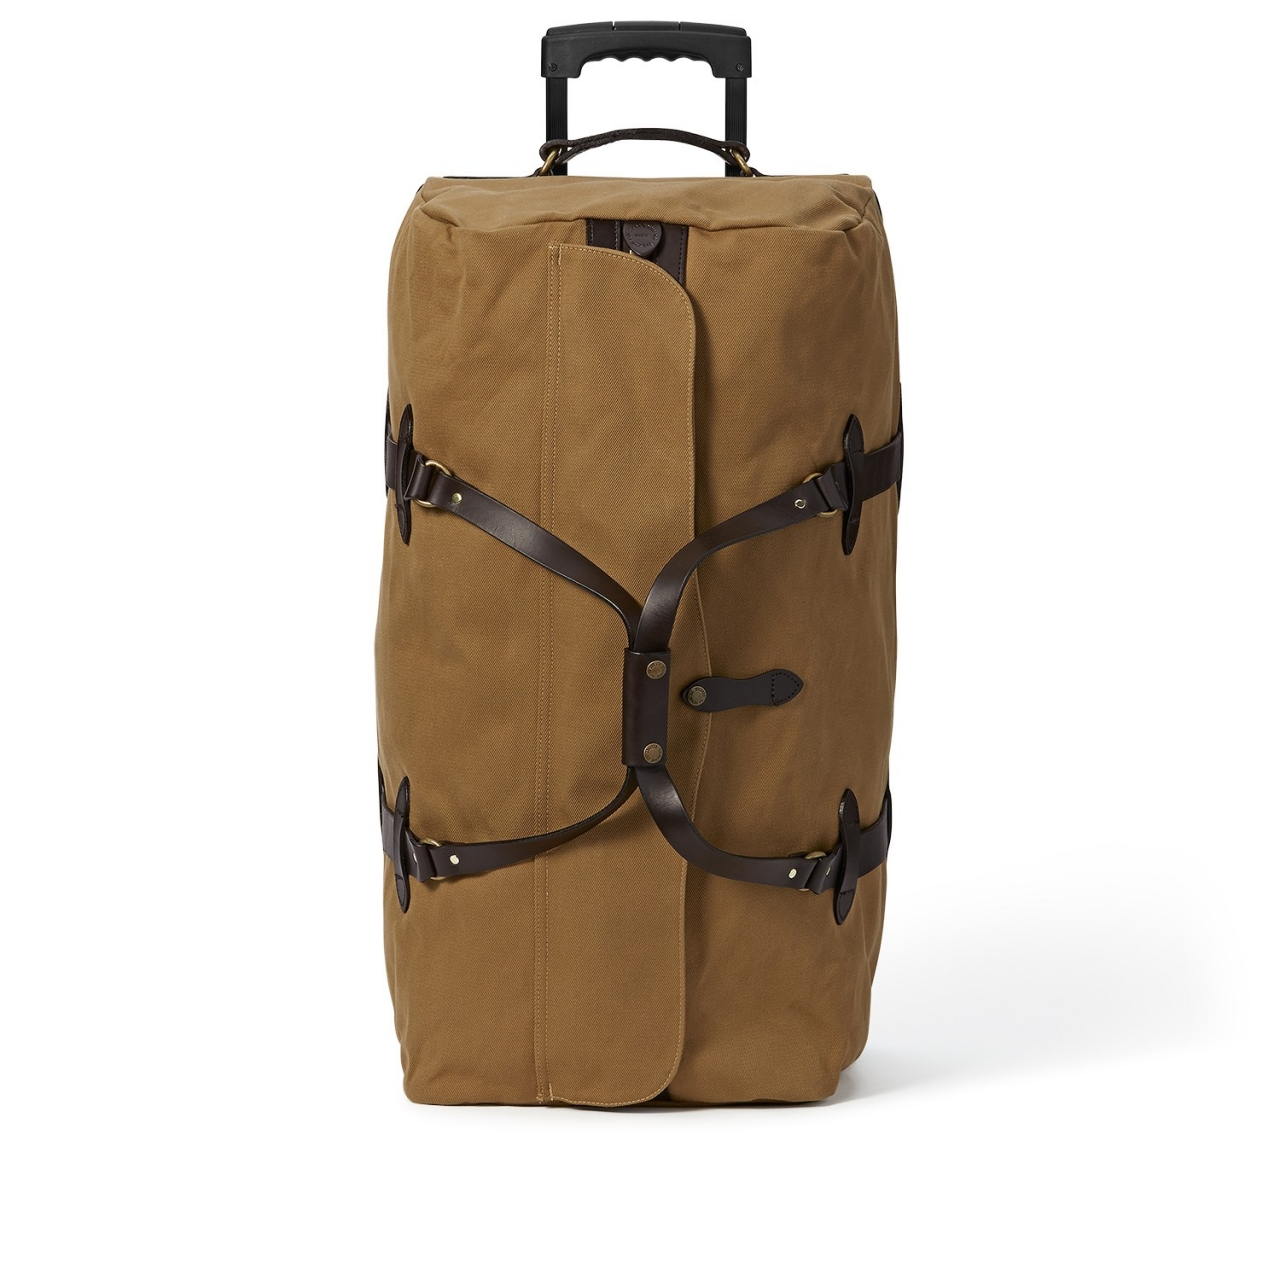 Filson Large Rugged Twill Rolling Duffle Bag - Tan